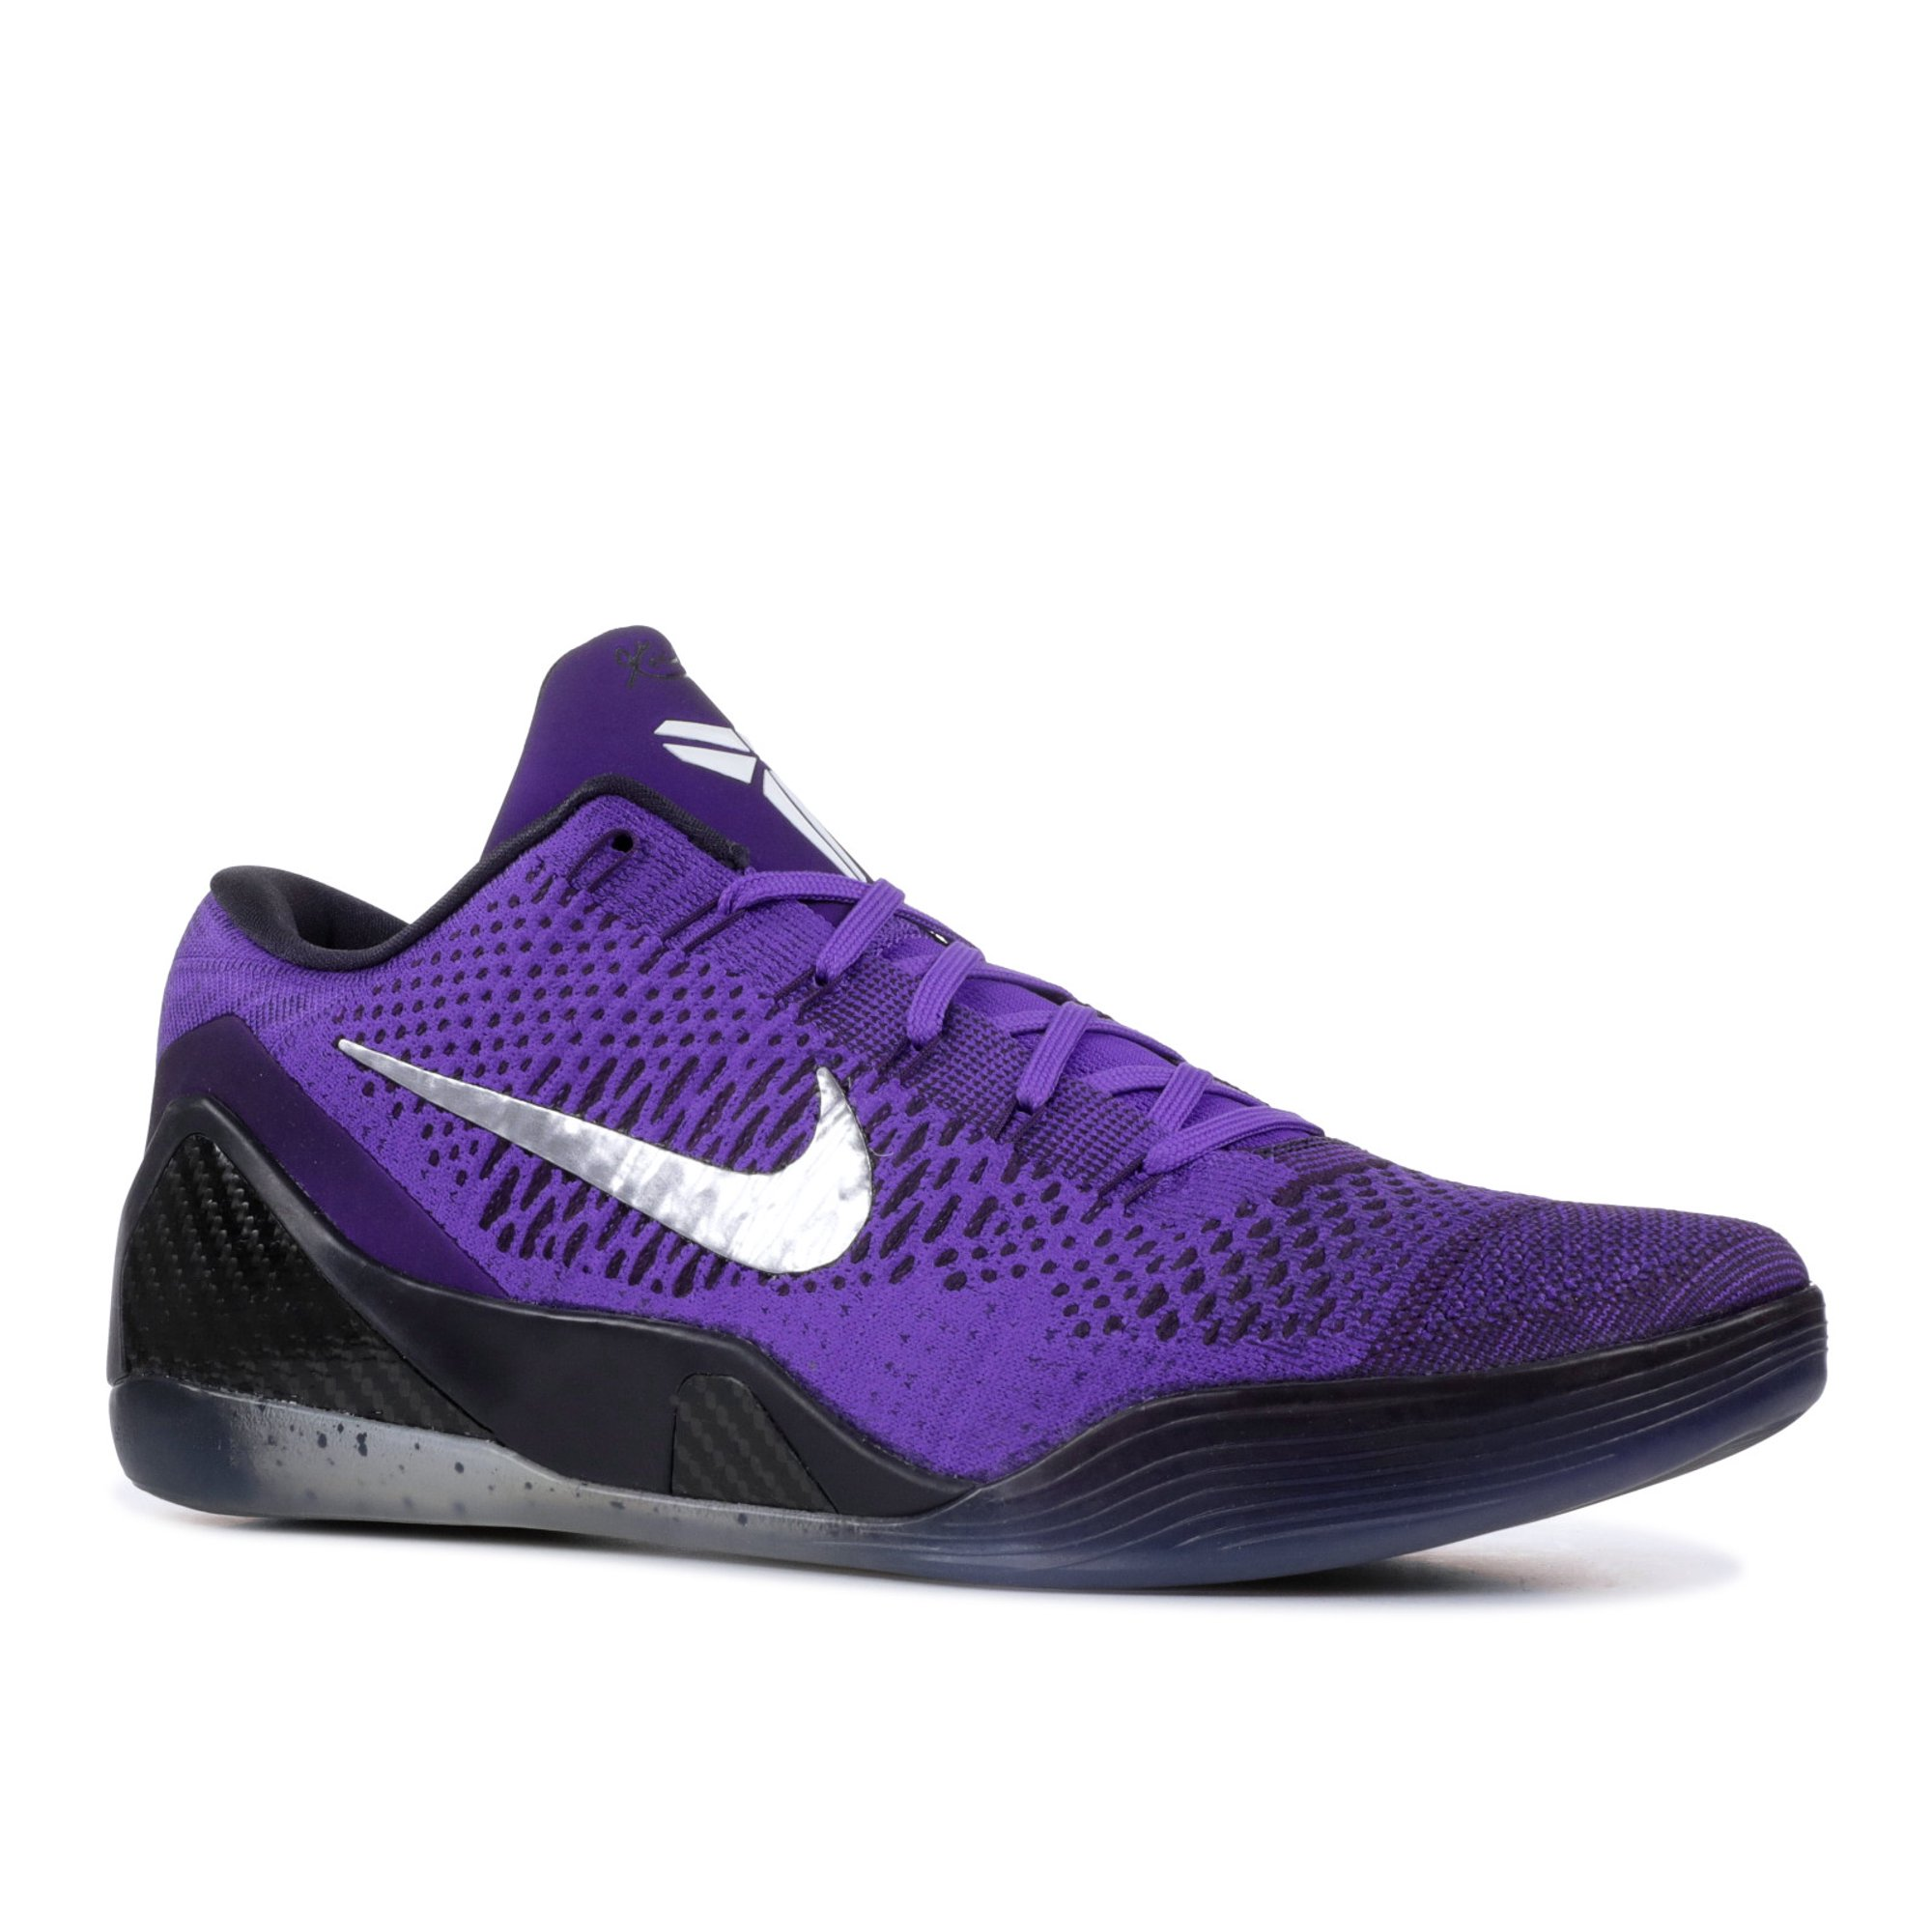 86de1ab83b69 Nike - Men - Kobe 9 Em Premium  Moonwalker  - 639045-515 - Size 13 ...